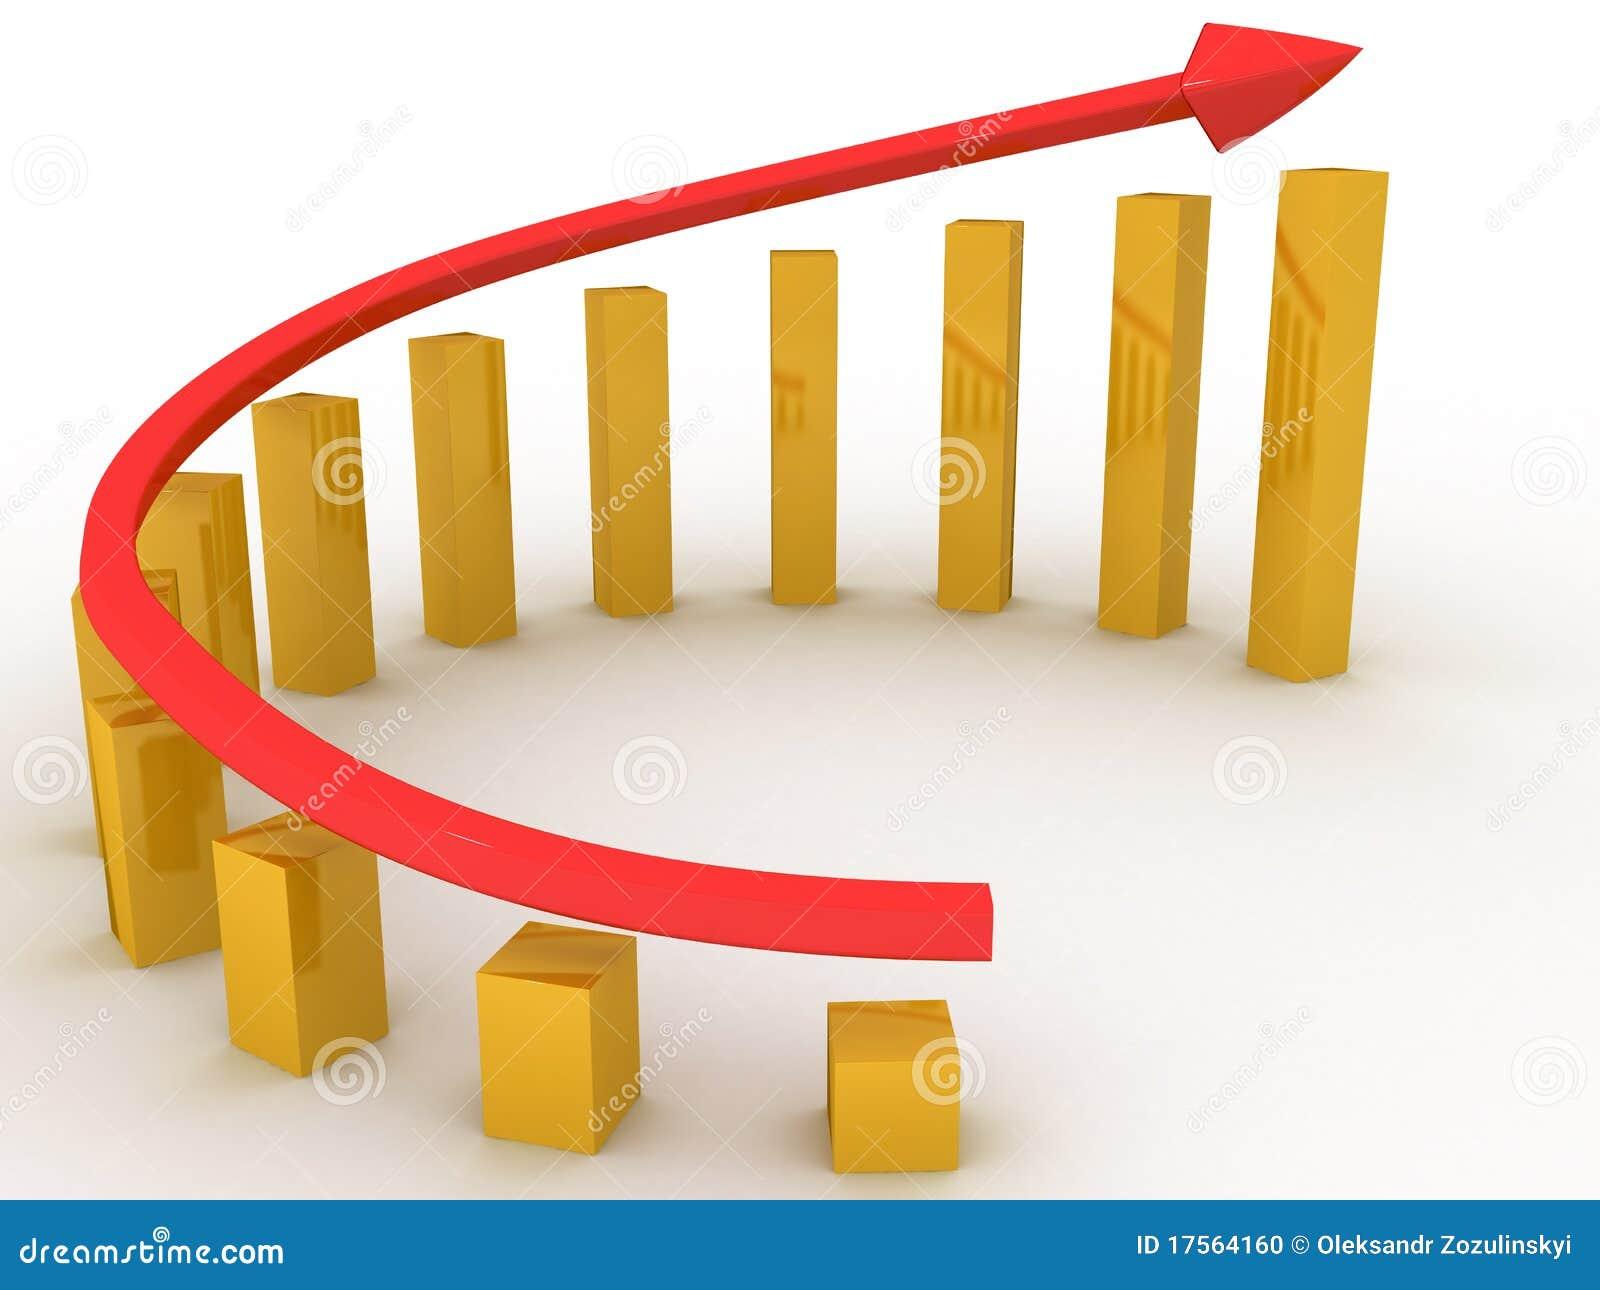 Economic Growth Charts Stock Photo - Image: 17564160